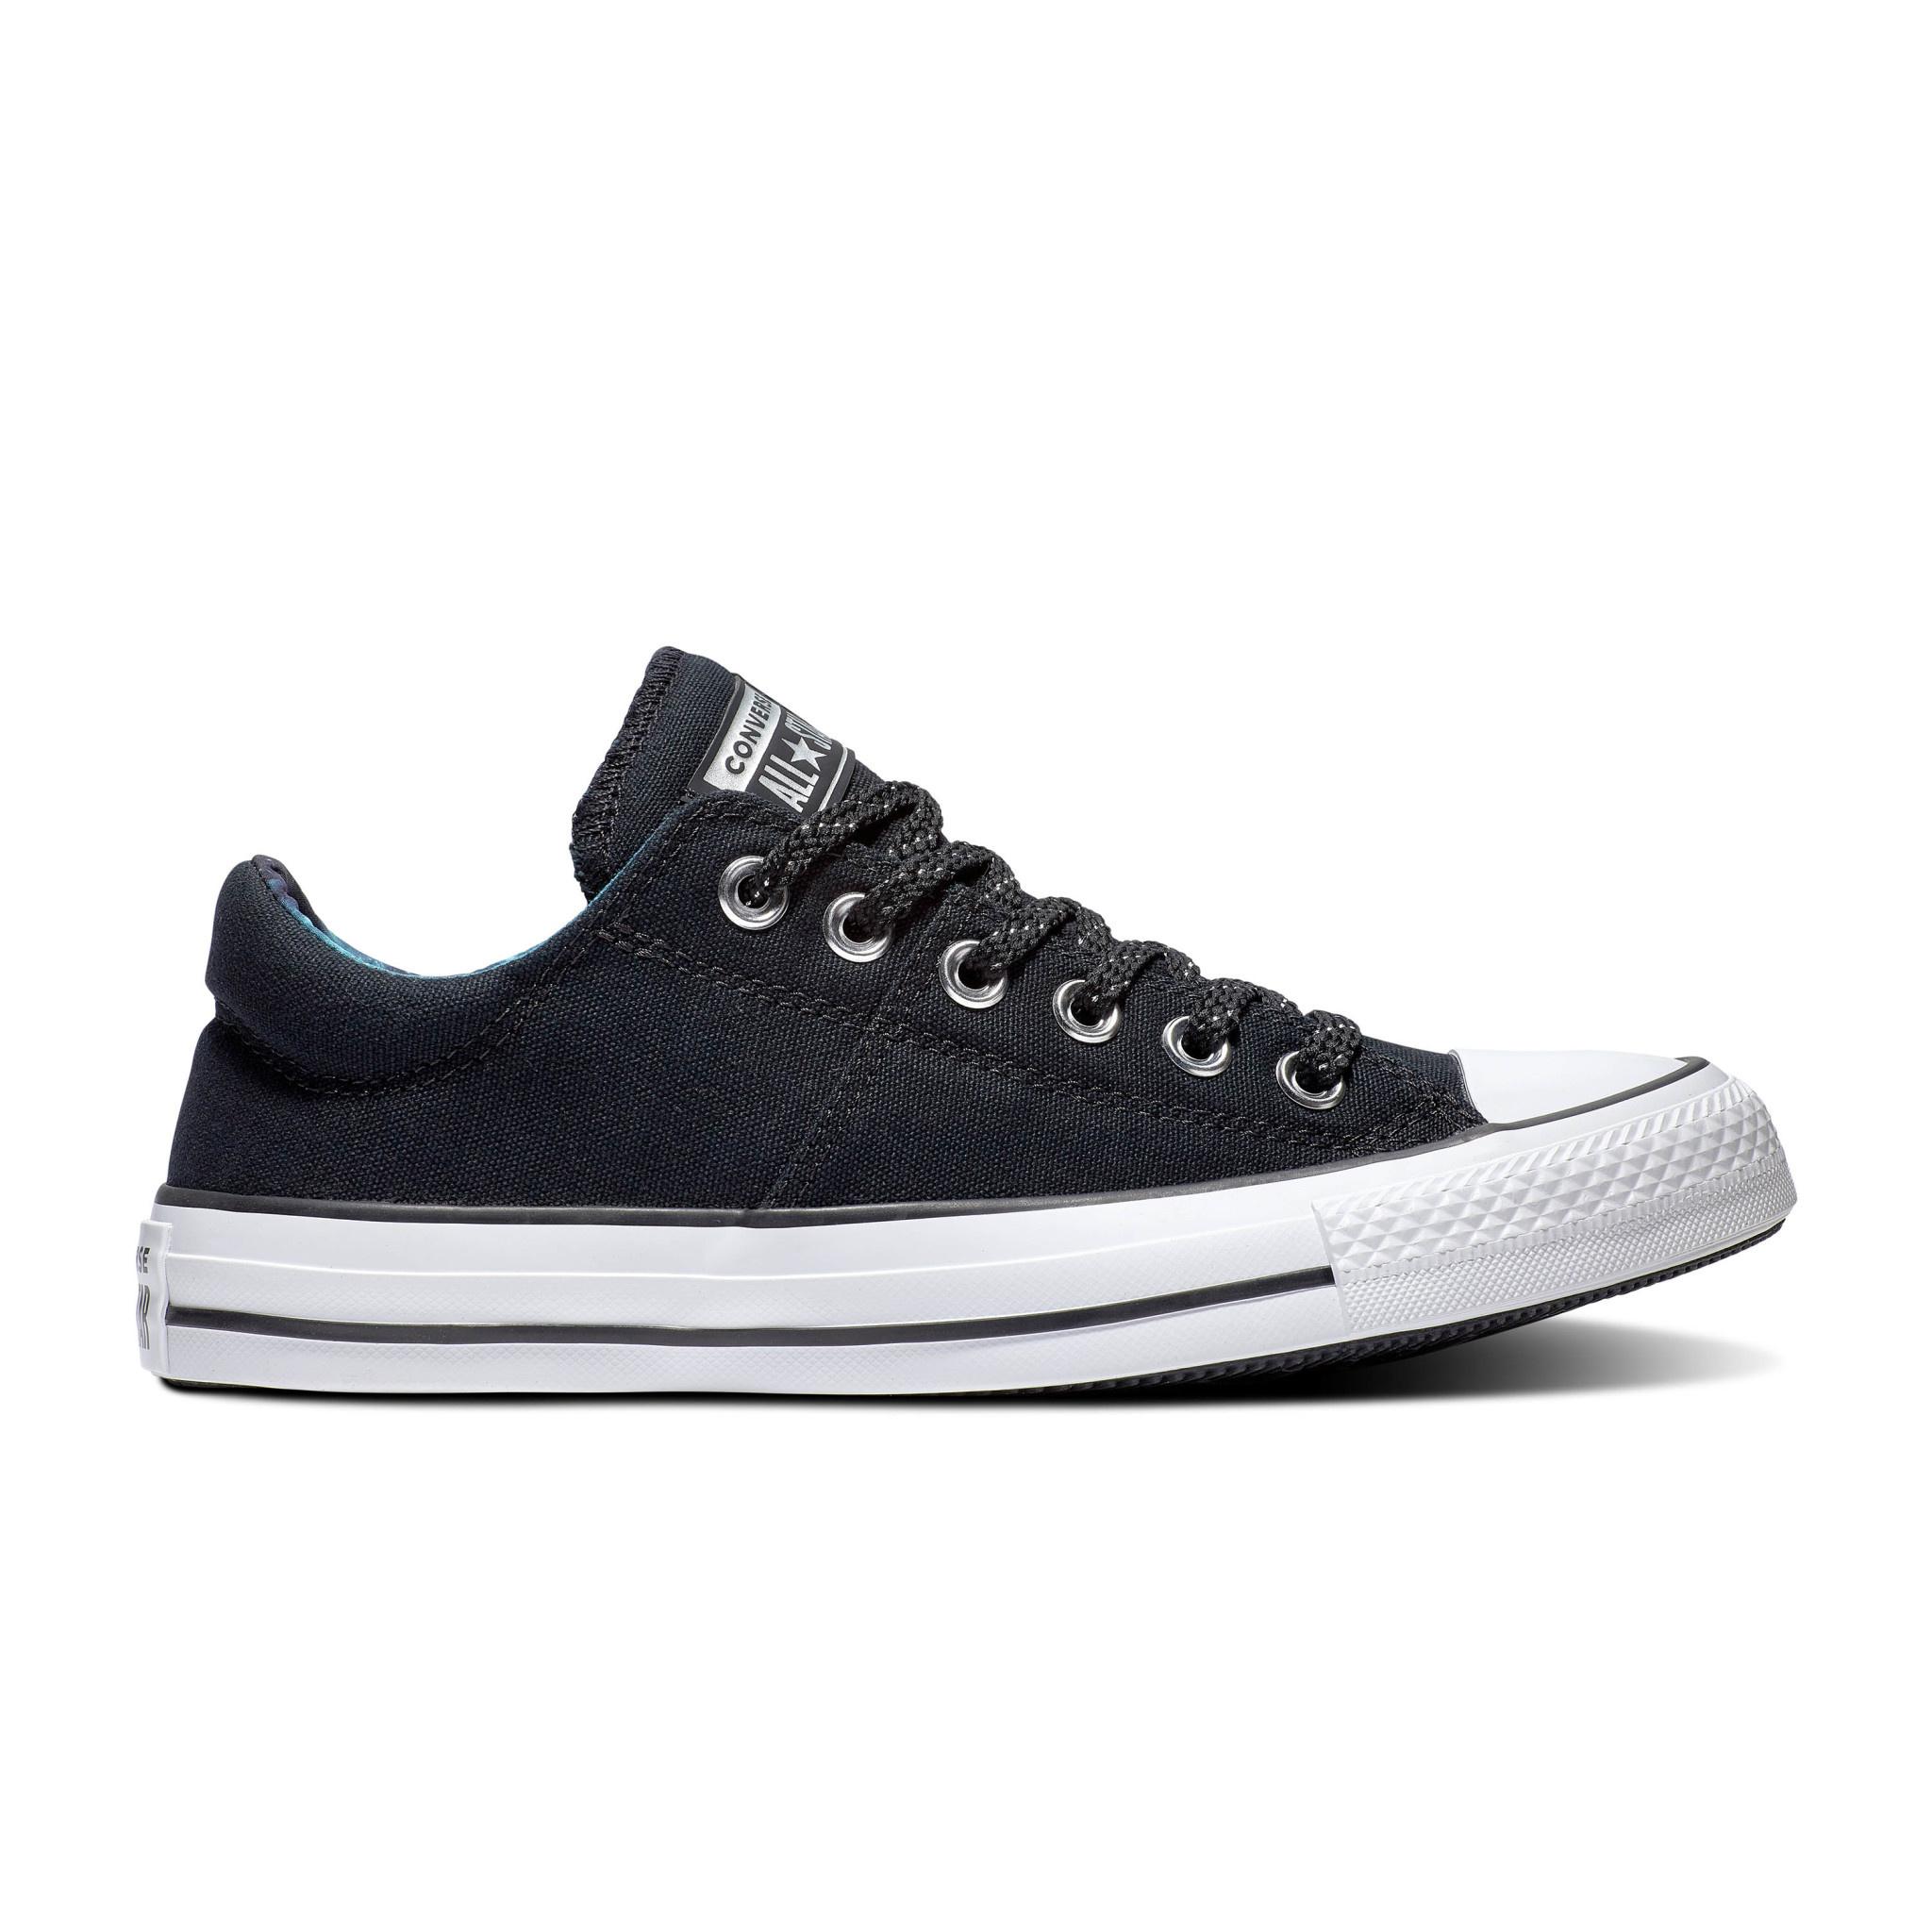 Cheap Converse Chuck Taylor All Star Sparkle Knit black